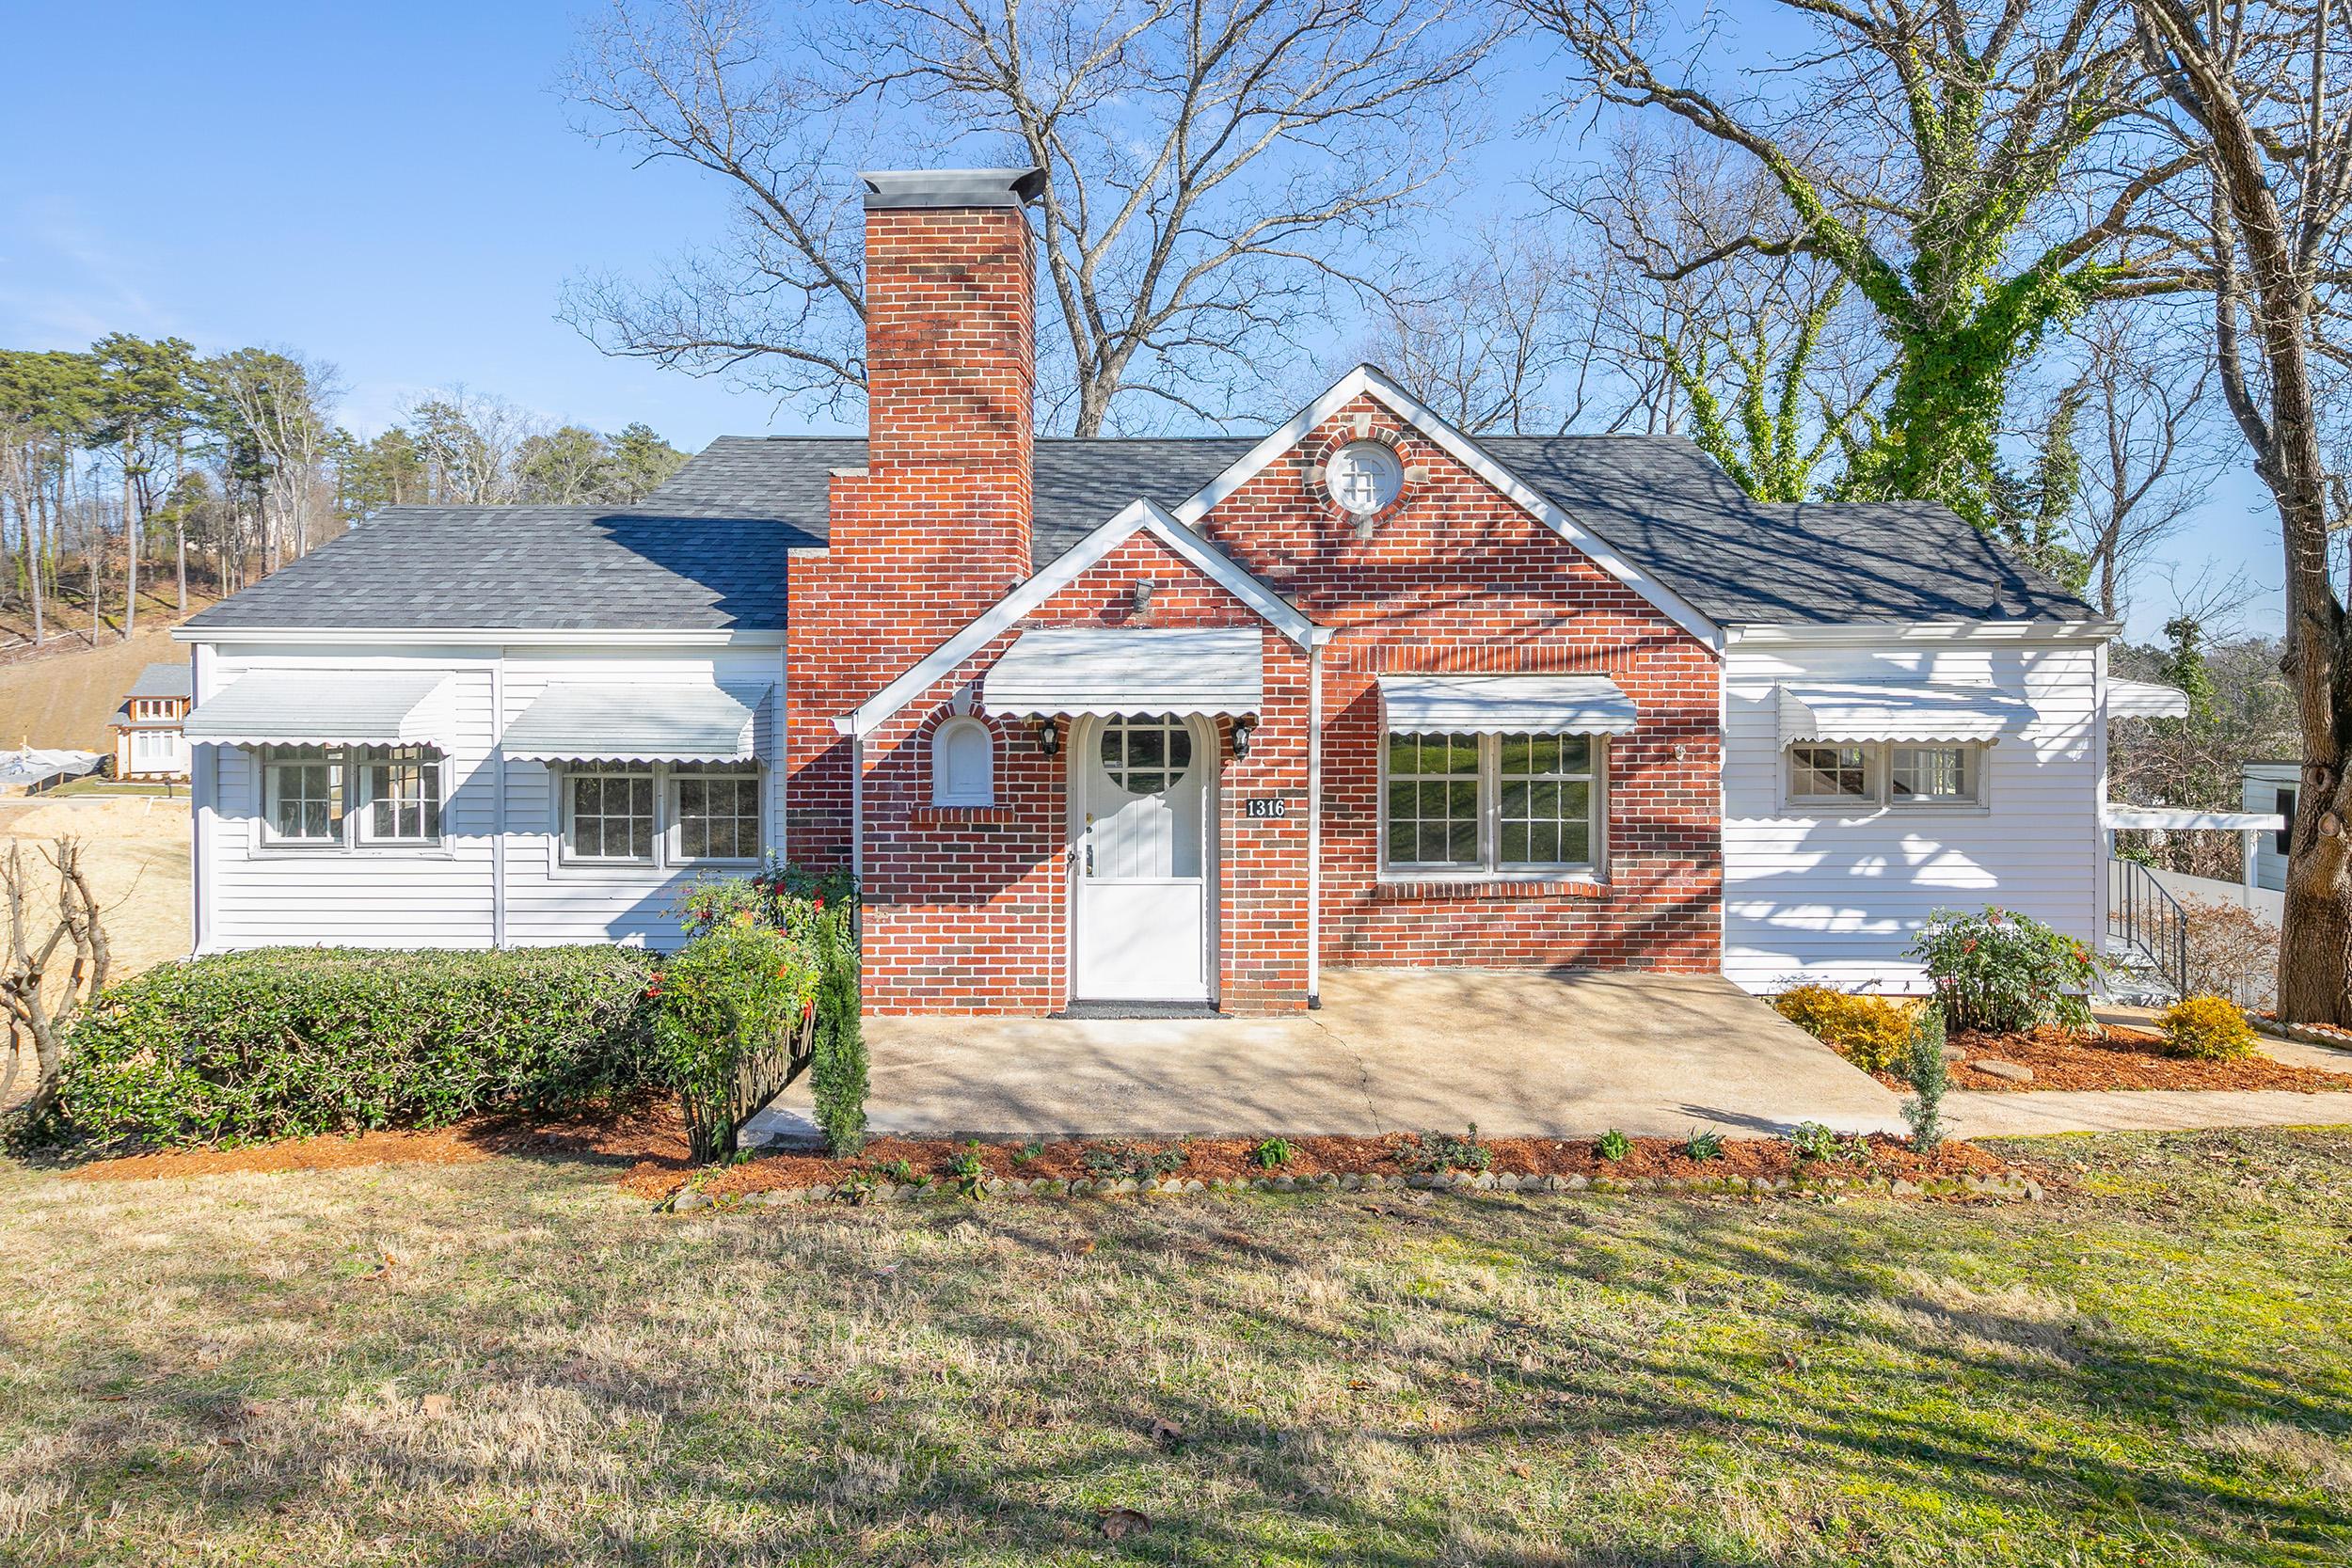 1316  Sharon  Cir 37405 - One of Chattanooga Homes for Sale